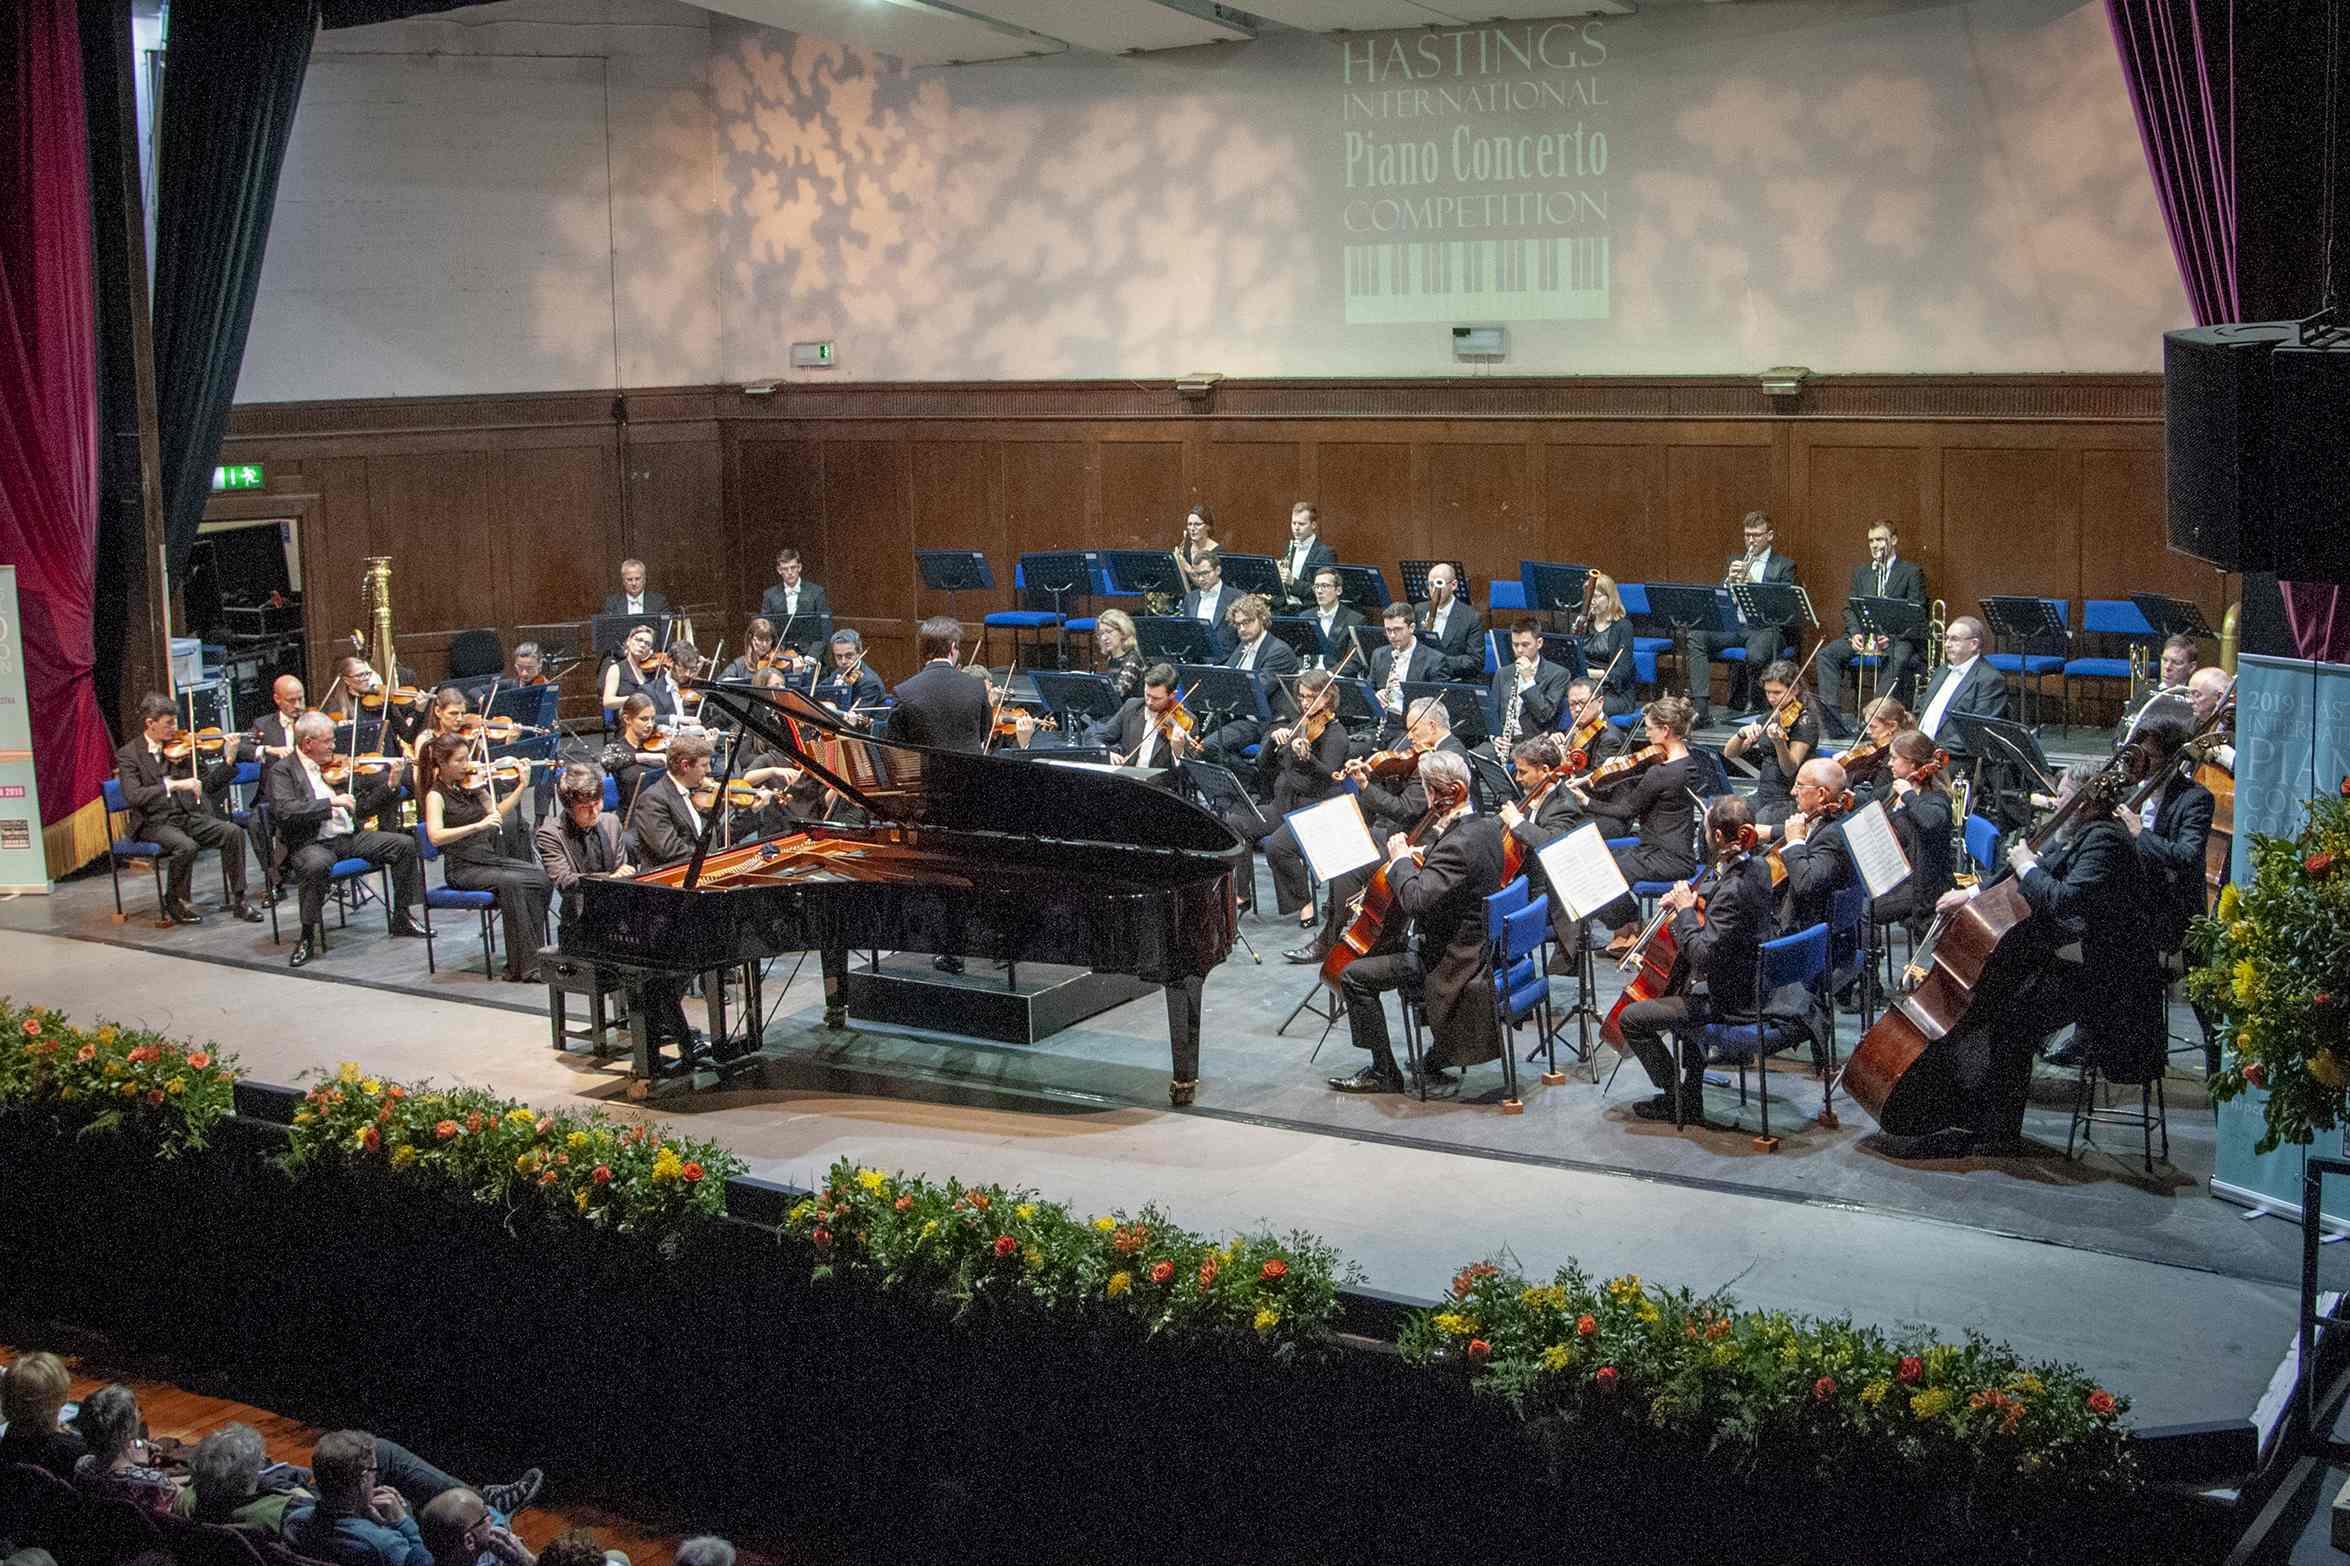 Winner of 2019 Hastings International Piano Concerto